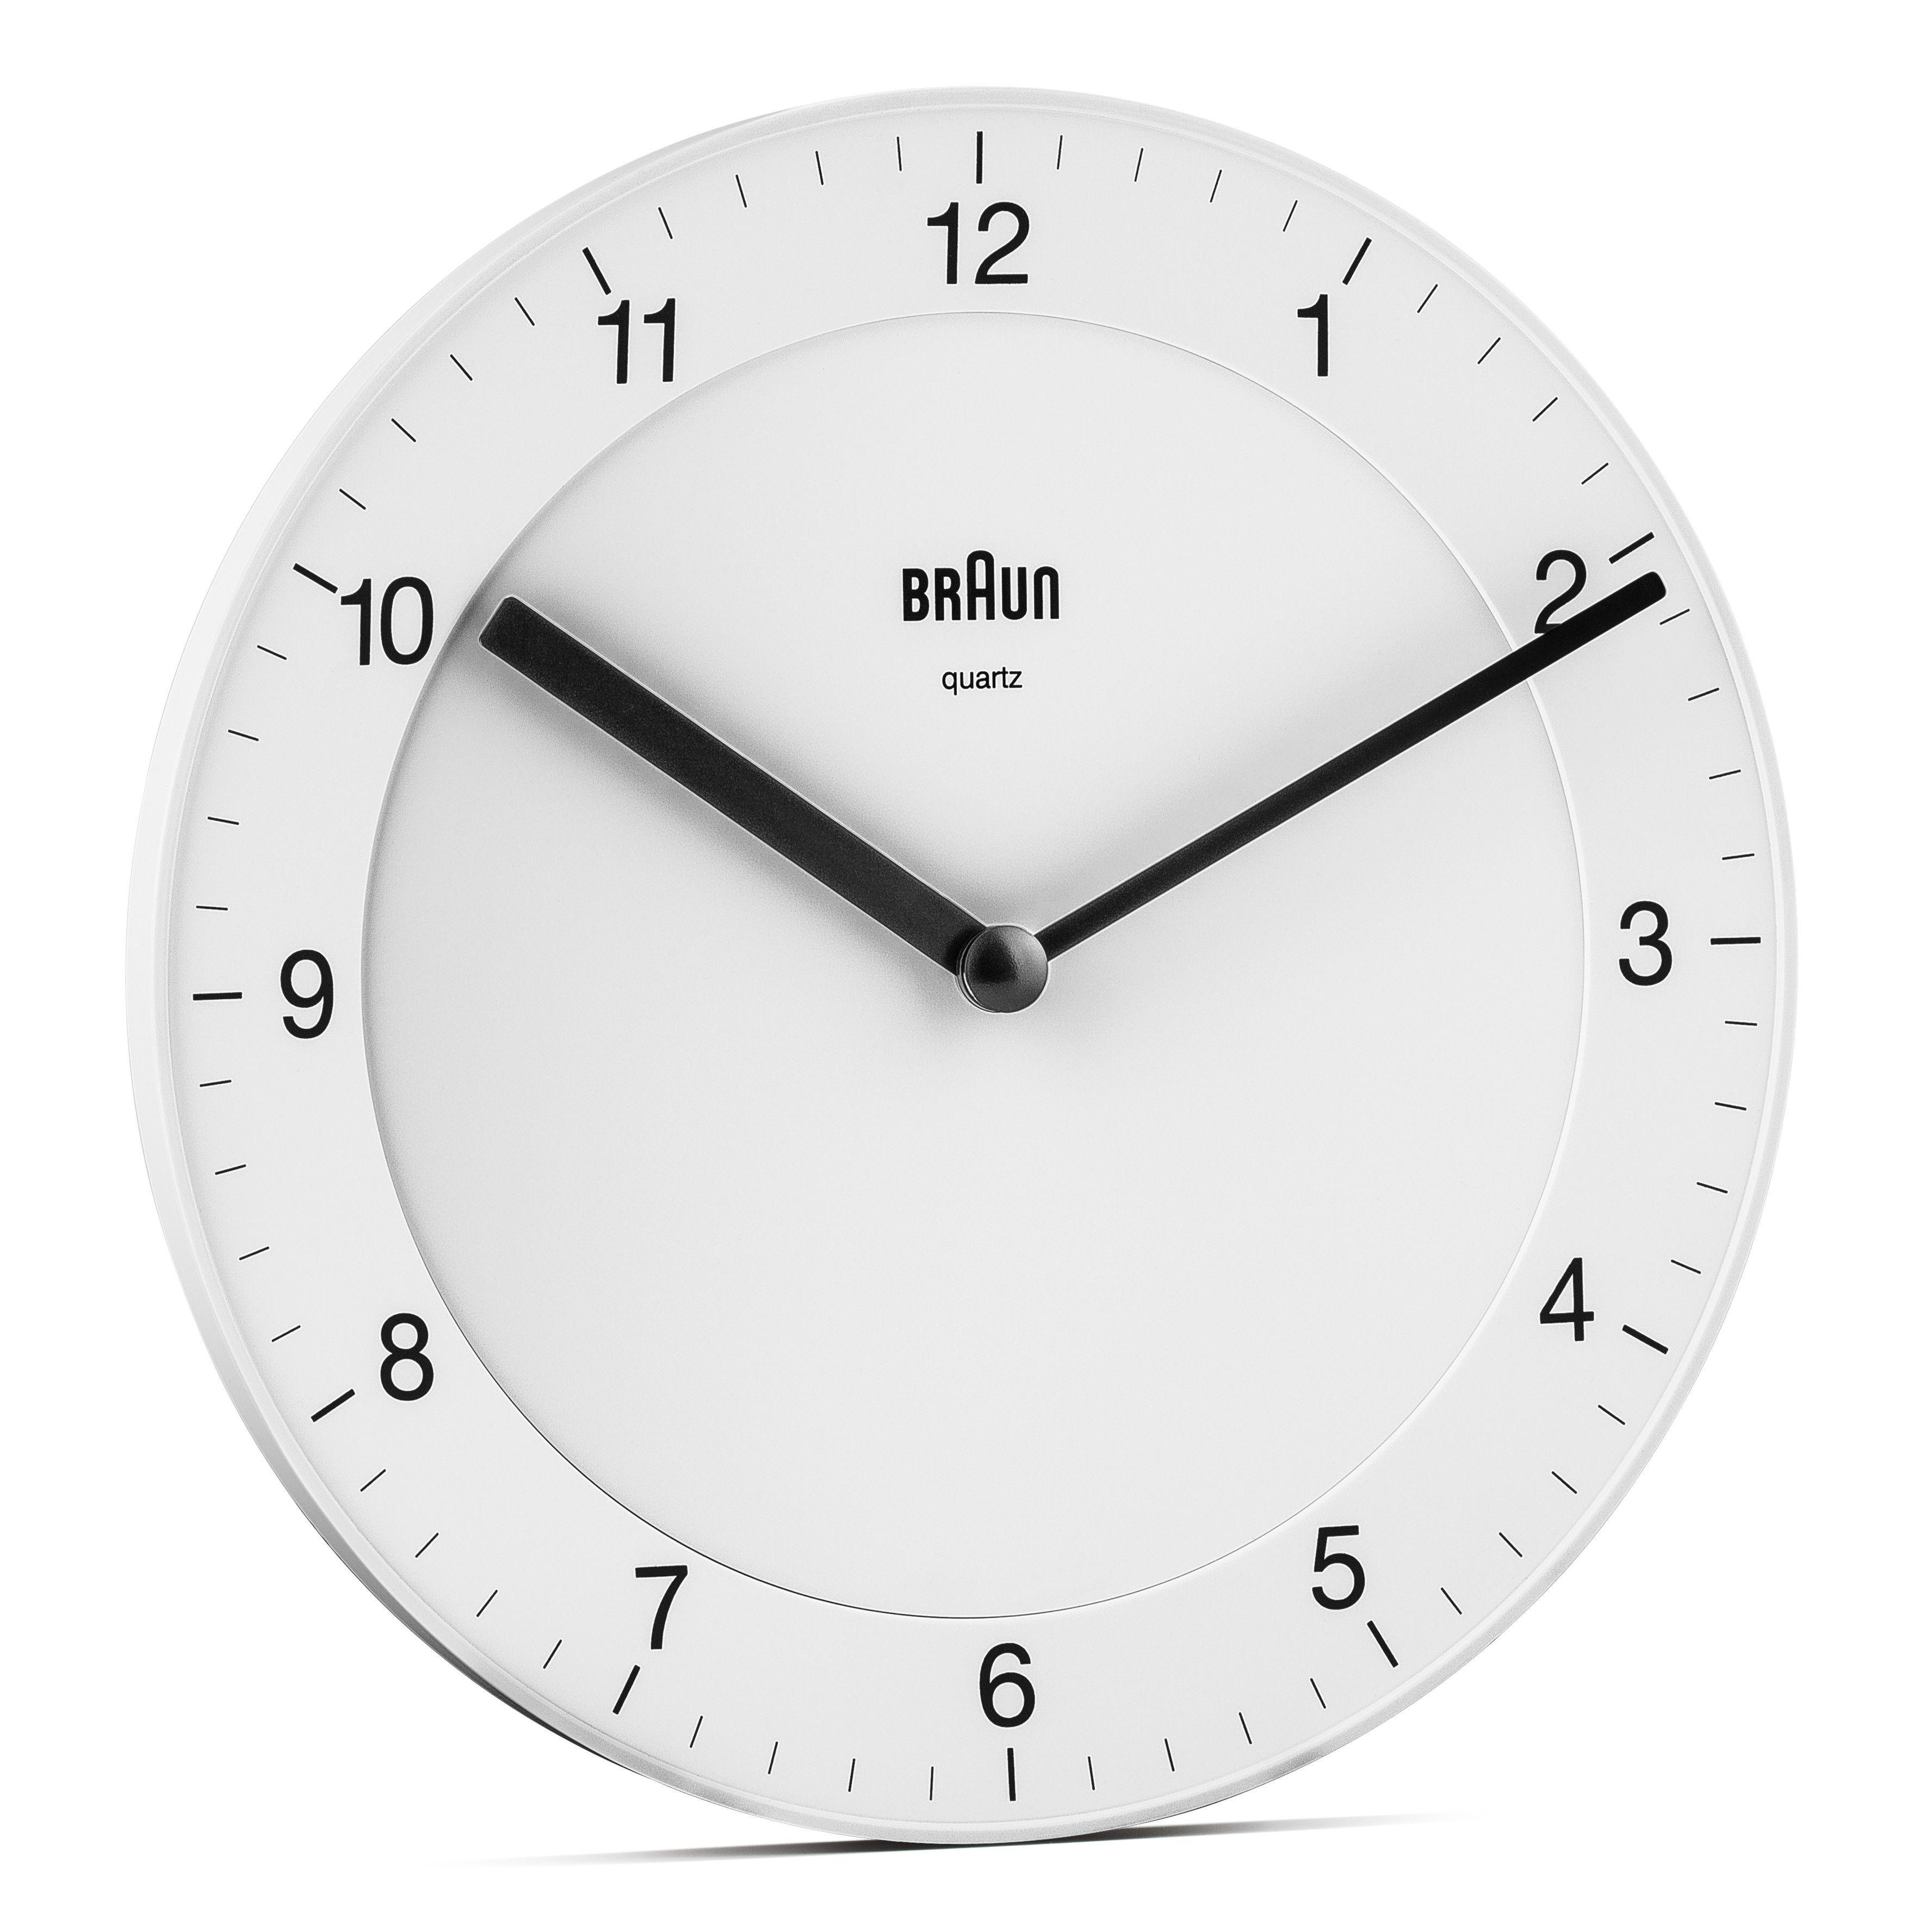 Bc06 Classic Analogue Wall Clock Classic Clocks Wall Clock Classic Wall Clock Clock